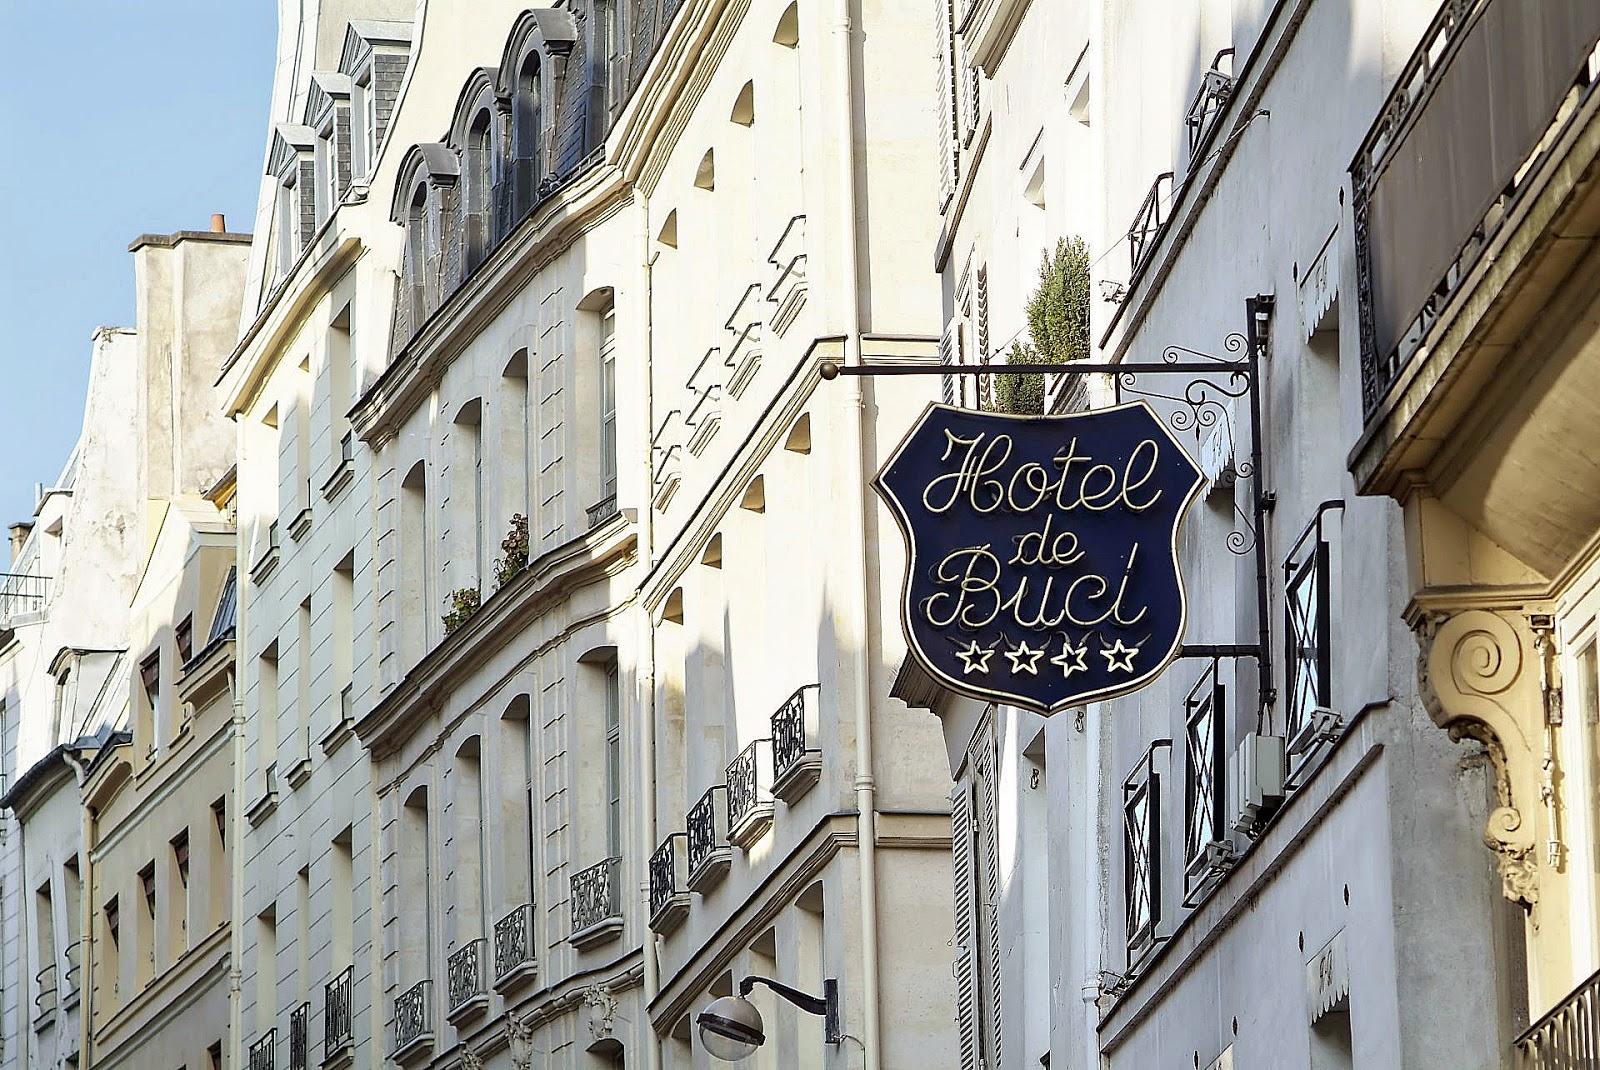 https://www.theaussieflashpacker.com/2015/03/luxury-hotel-review-hotel-de-buci-paris.html